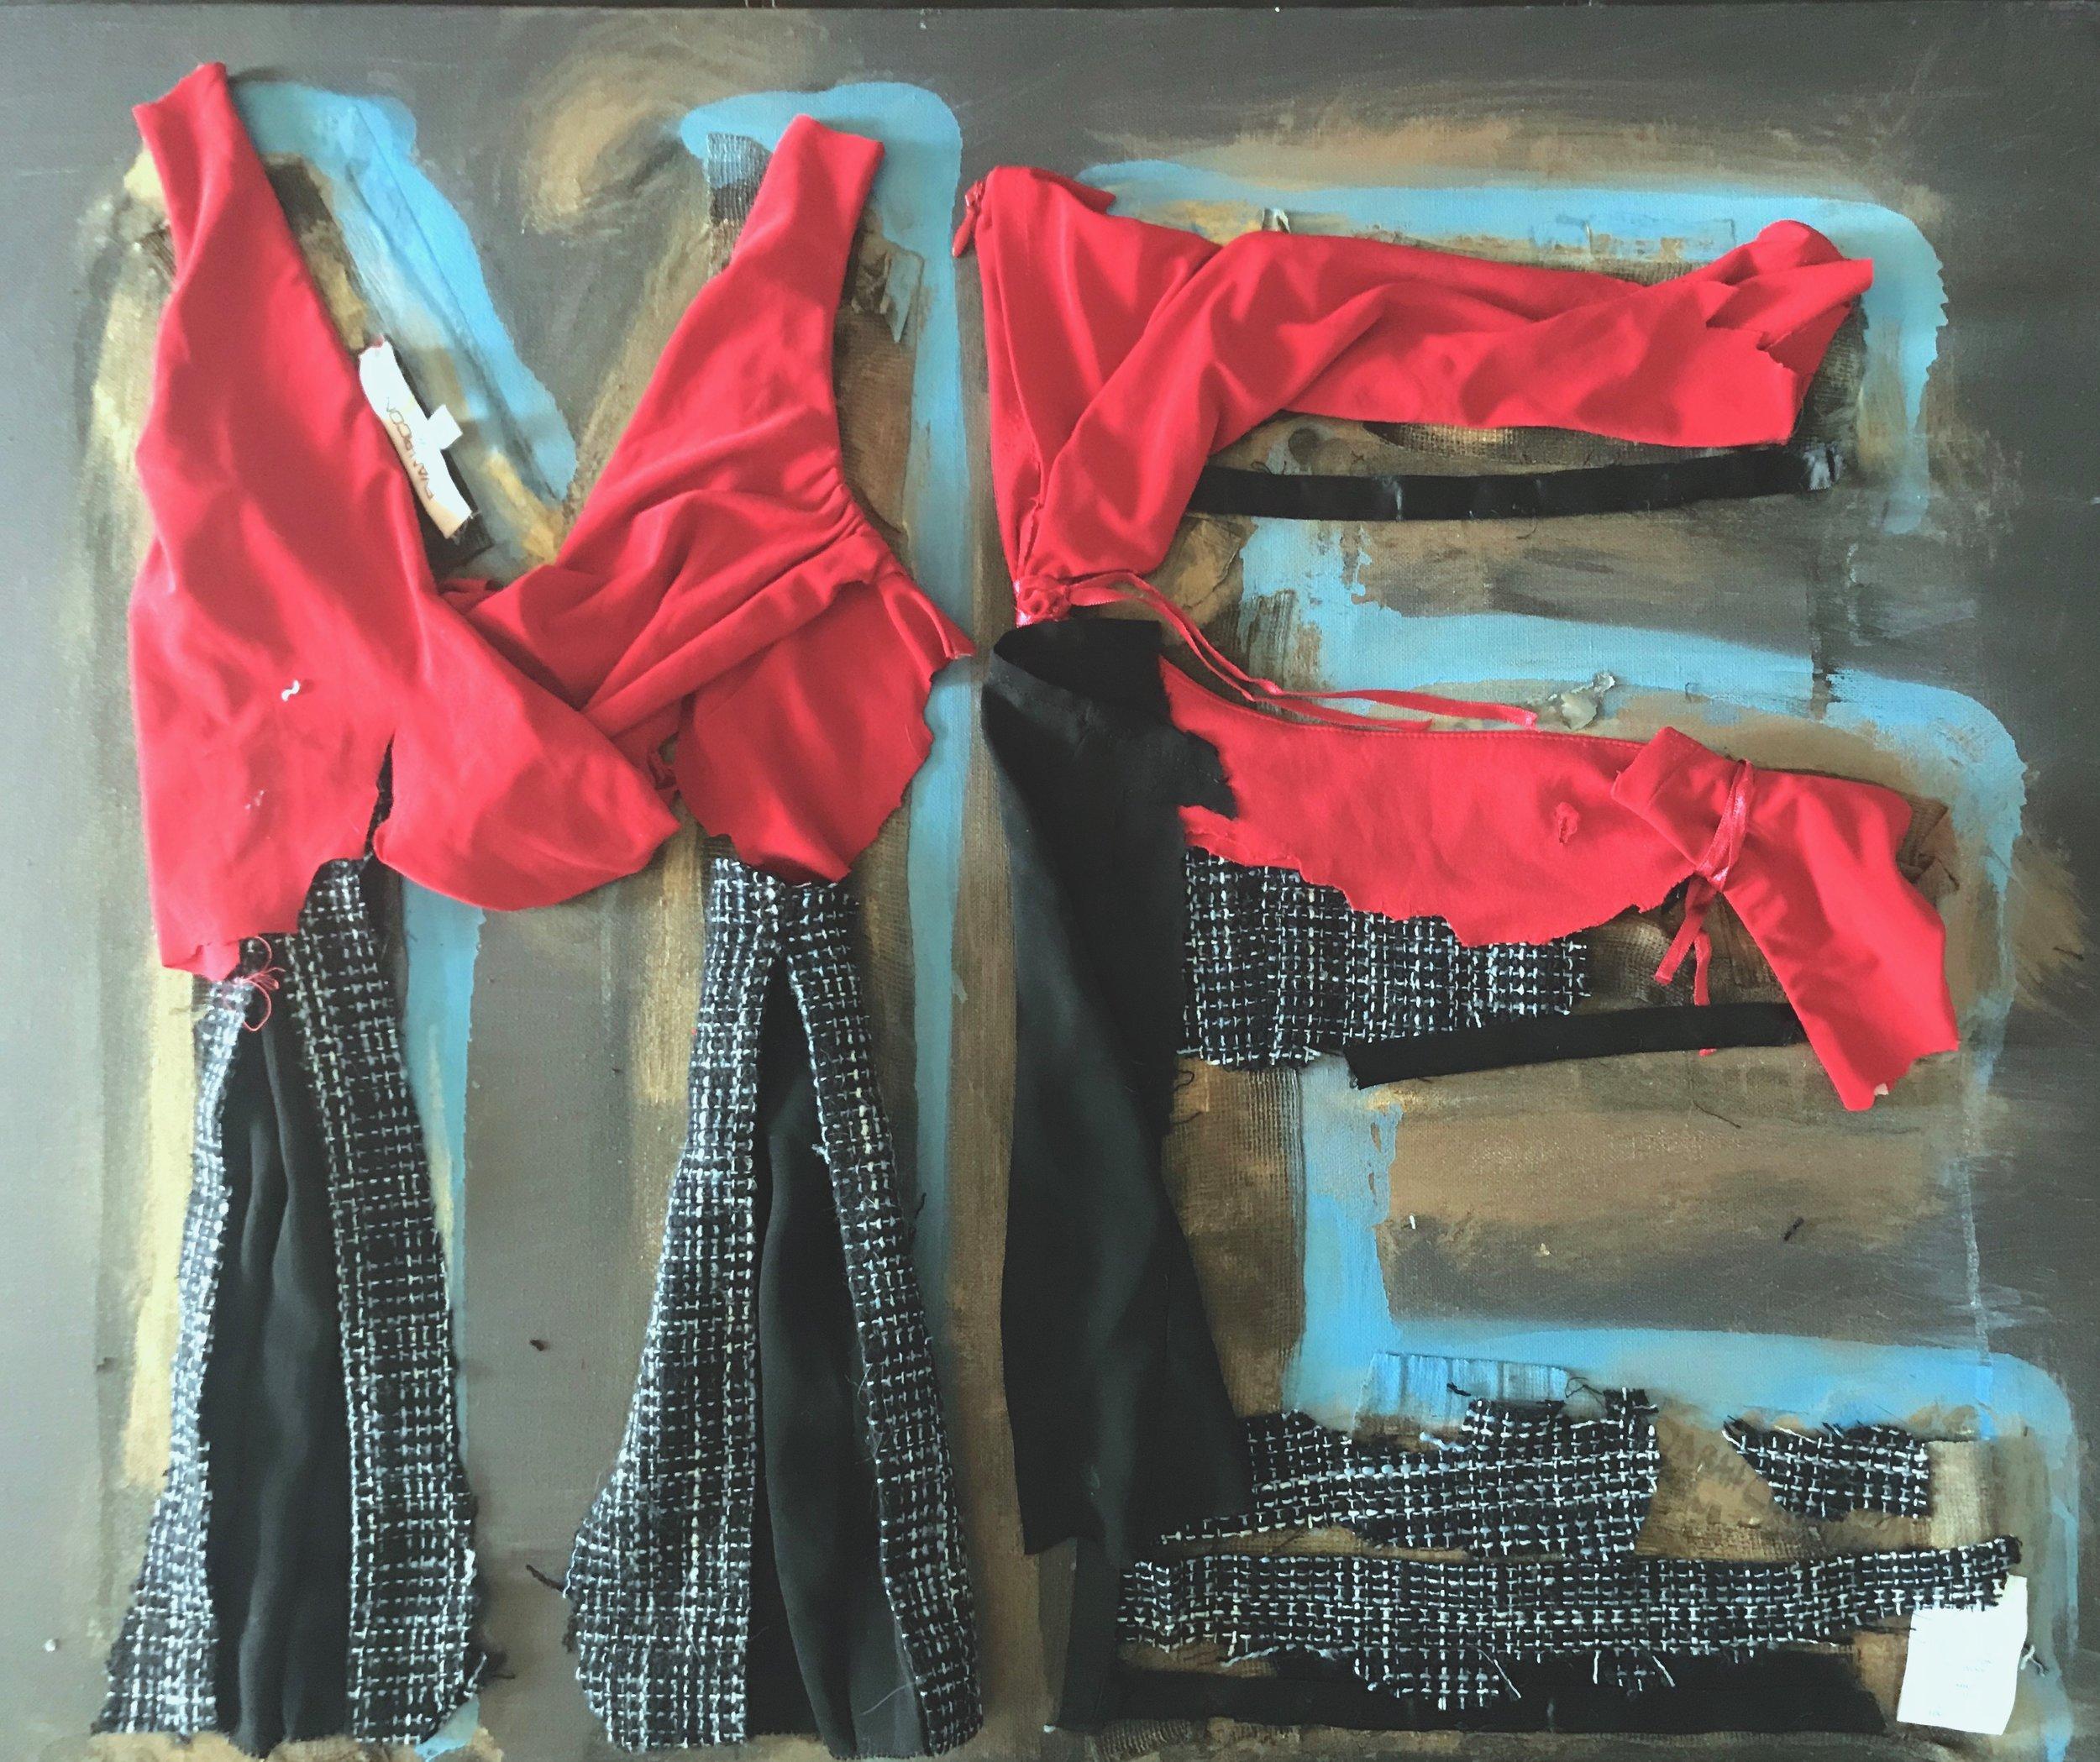 "NARCISSISM  2018 24"" x 36"" acrylic, gauze, cloth, eyeshadow, paper on canvas"